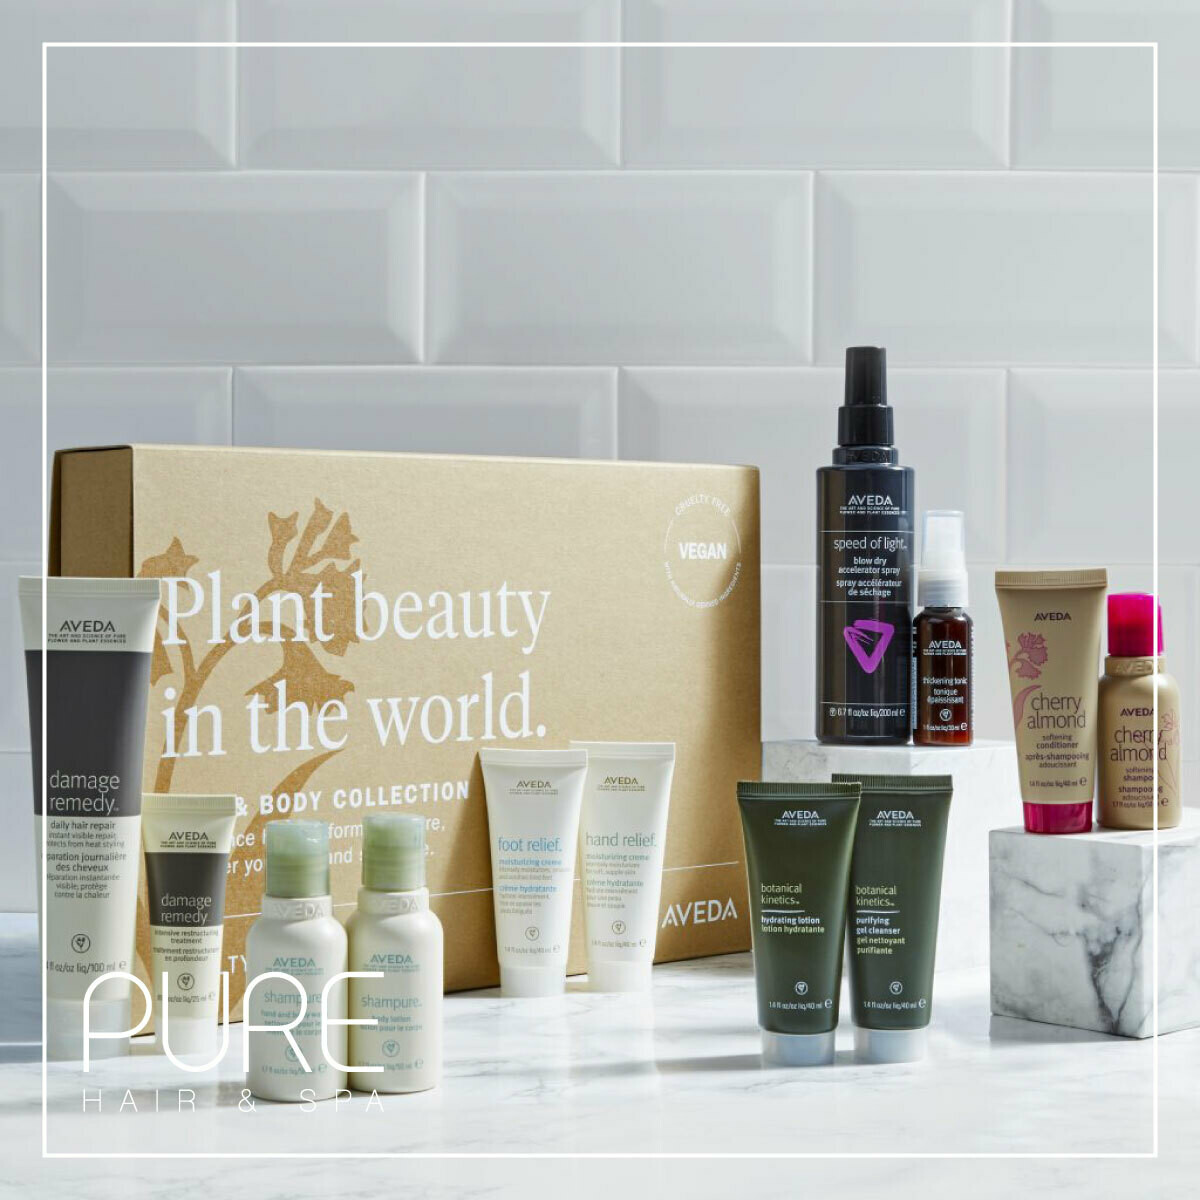 Aveda Vegan Edit Hair & Body Gift Set